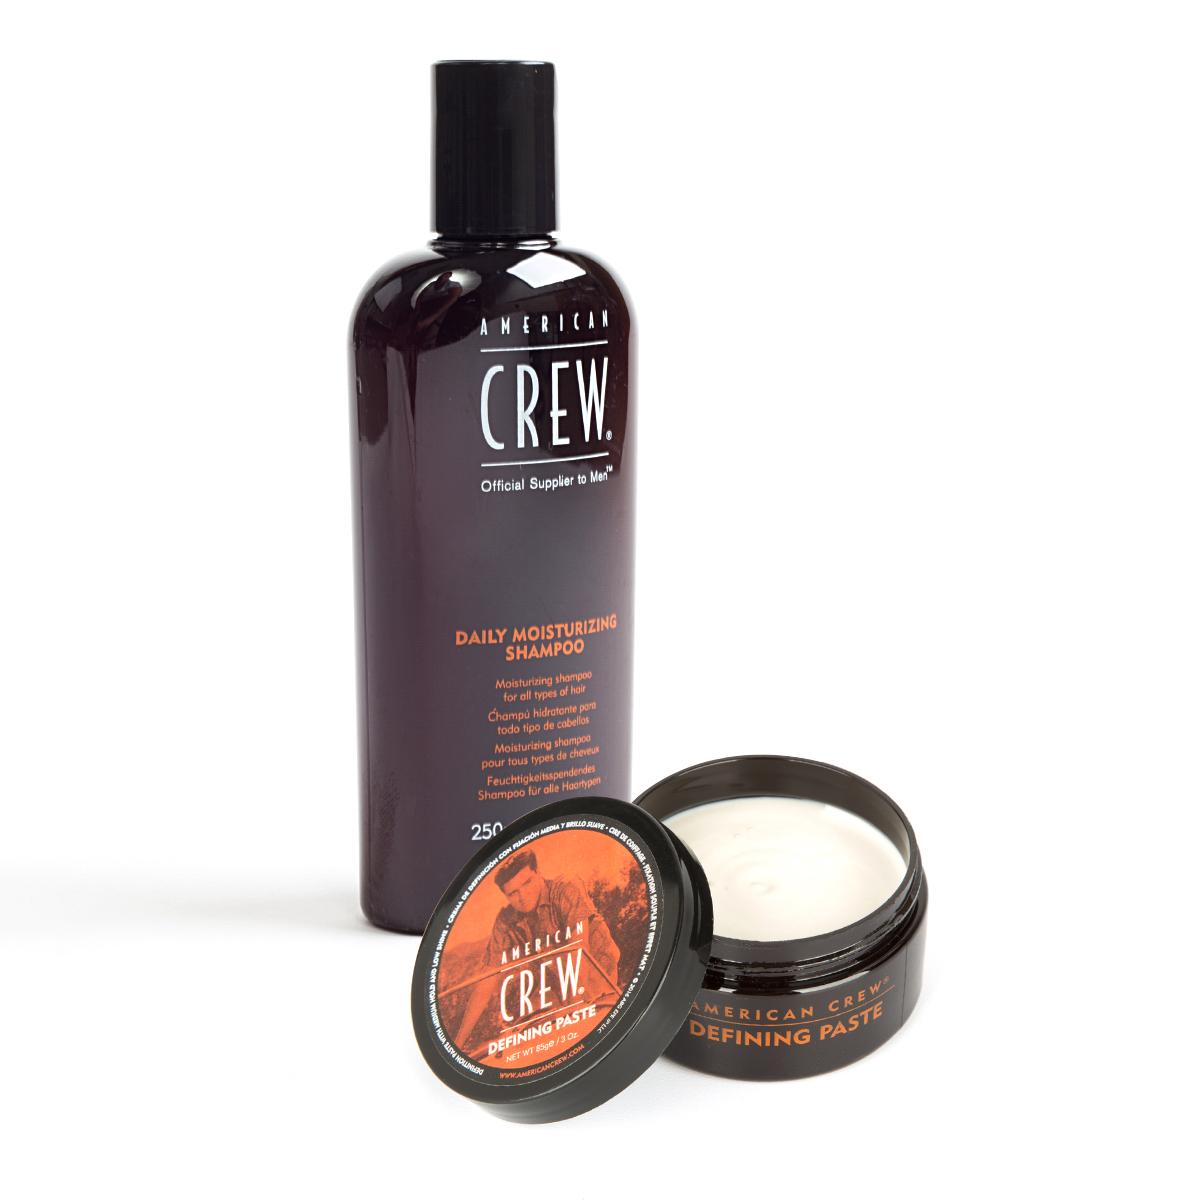 American Crew King Defining Paste + Daily Shampoo Bundle